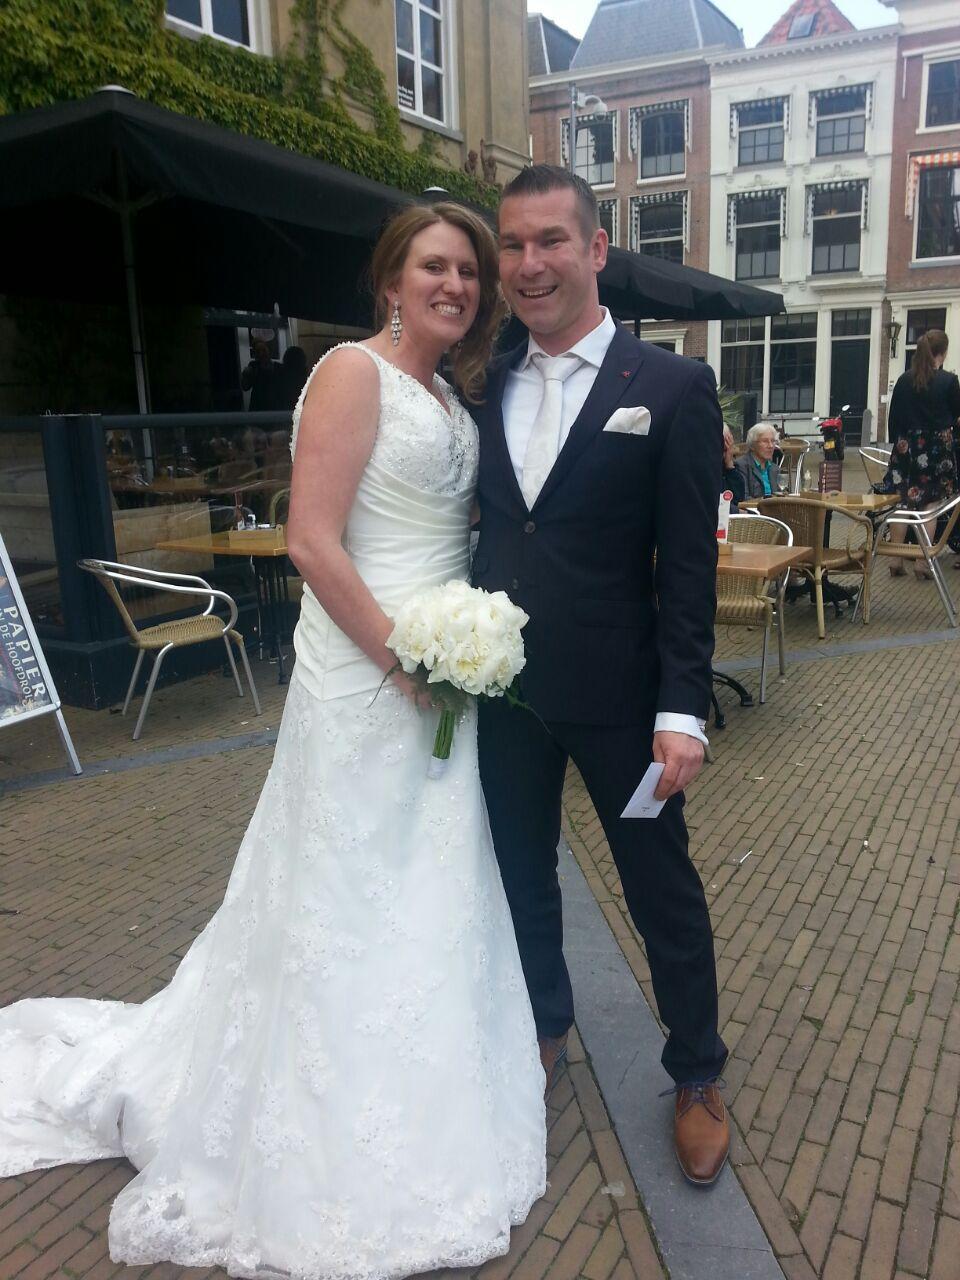 Bruidspaar Jochem Akooij & Liza van der Vegt (15-05-2015).JPG